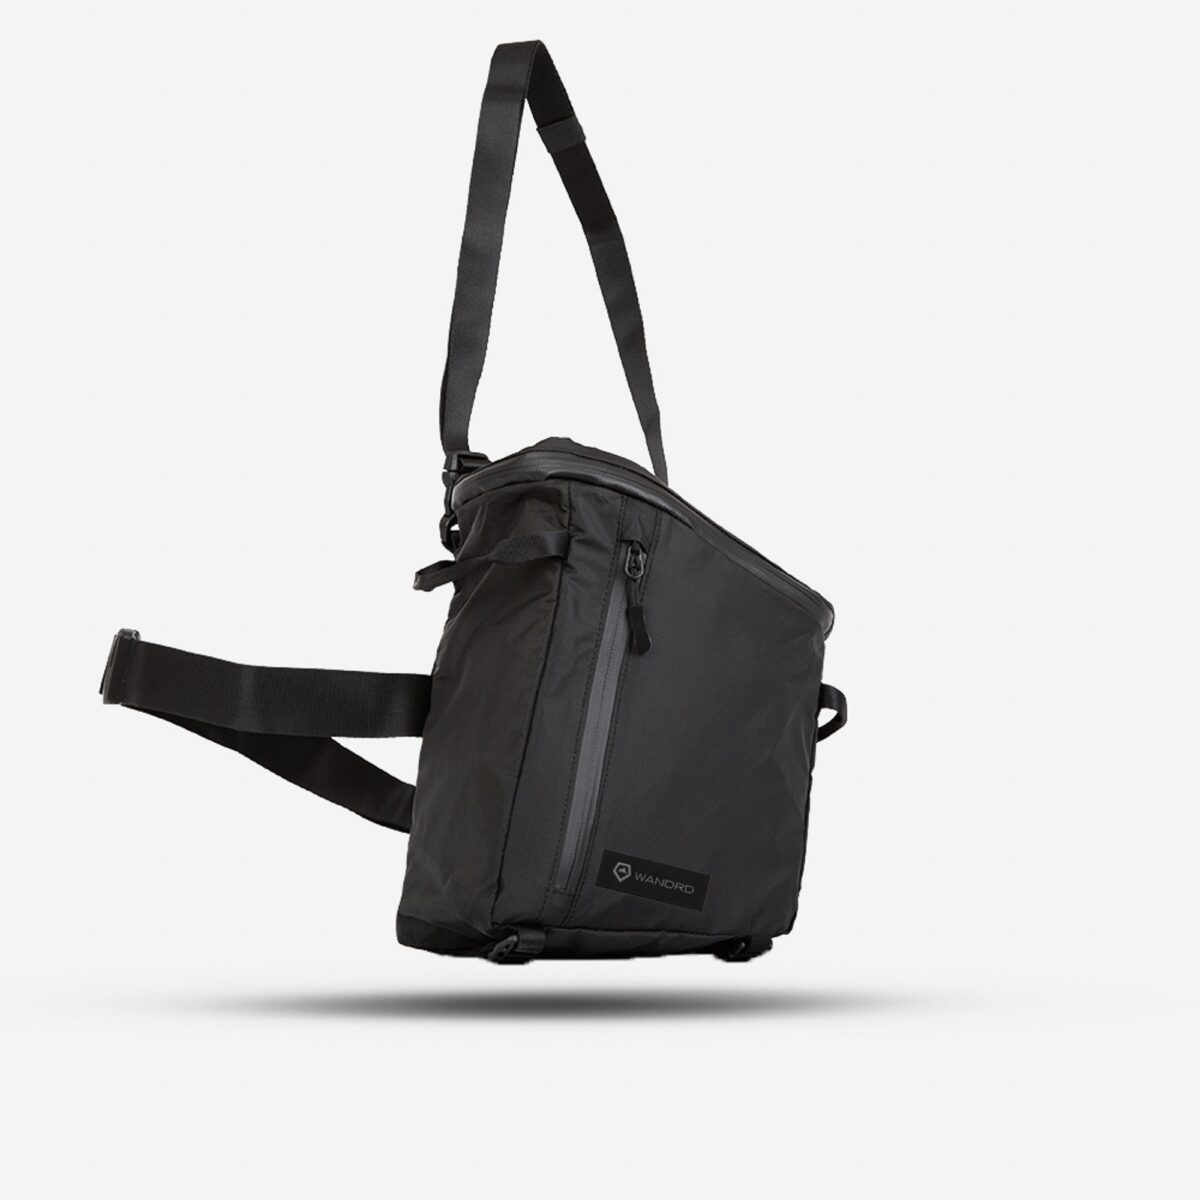 Wandrd Detour 5 bag - black